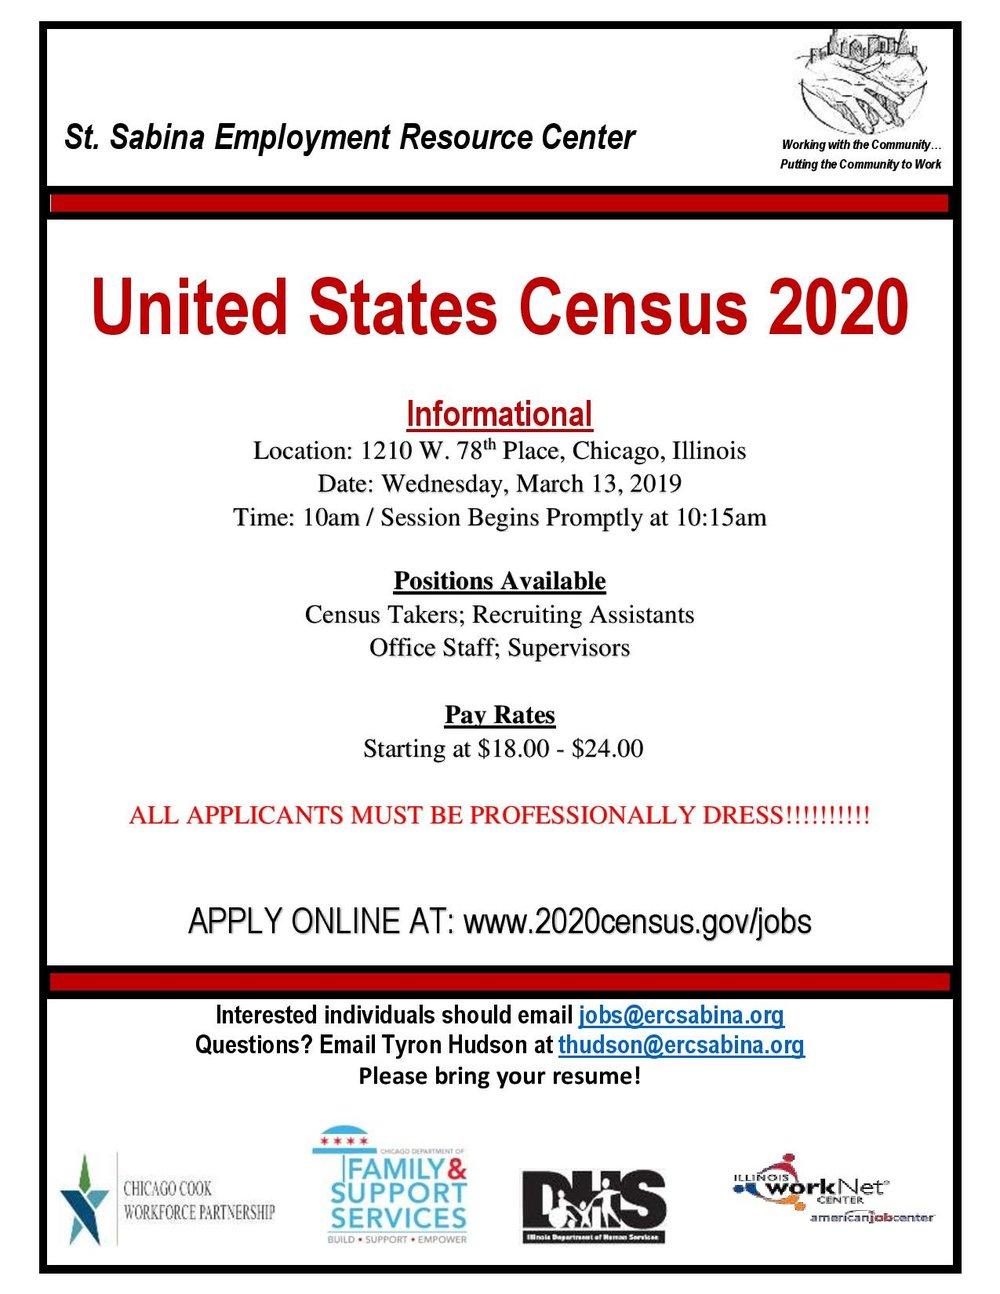 united states censusfinal-page-001 (1) (002).jpg